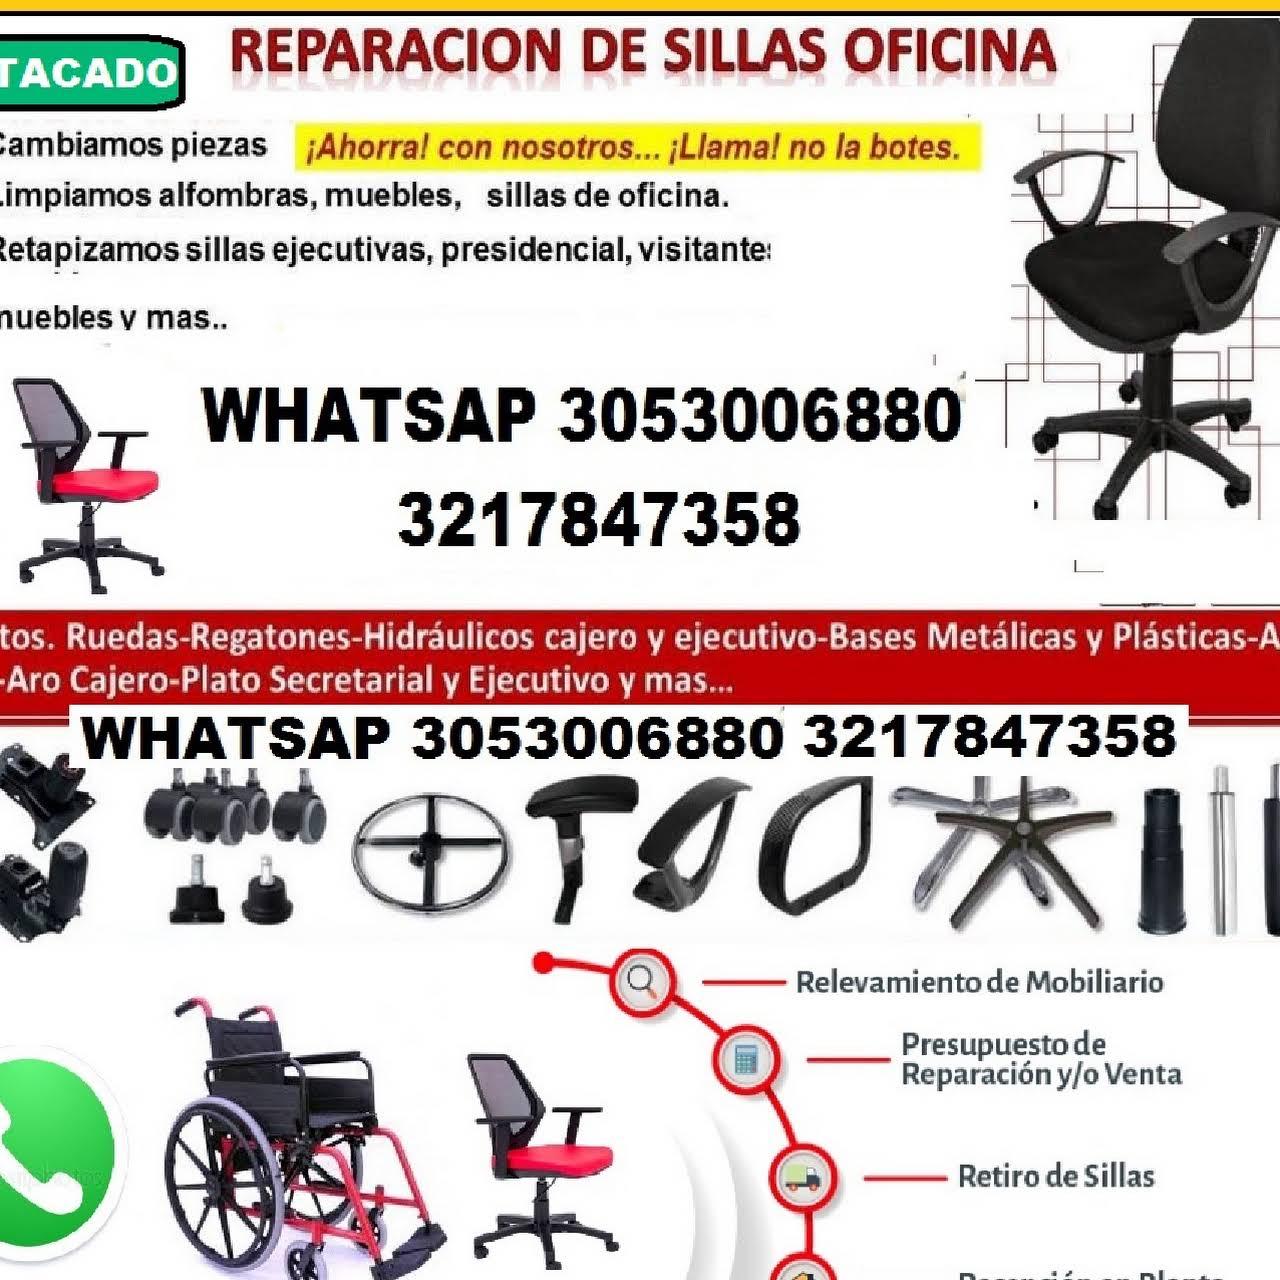 Oficina Jrl3a54 Base Reparar 4j3rl5aq Metalica Silla m0w8Nn